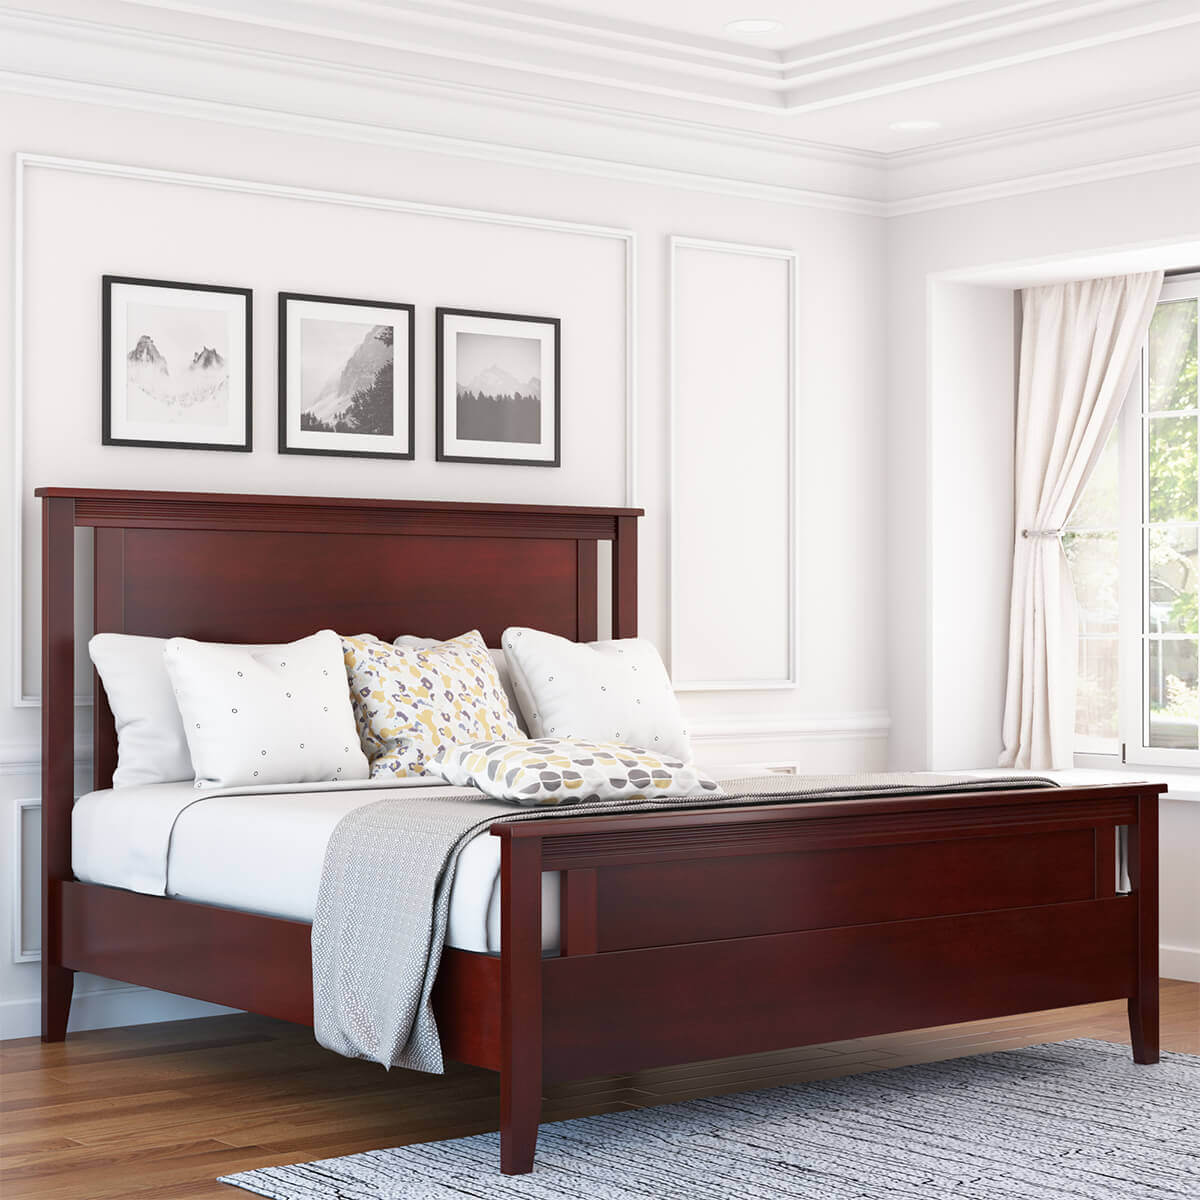 amenia solid mahogany wood platform bed